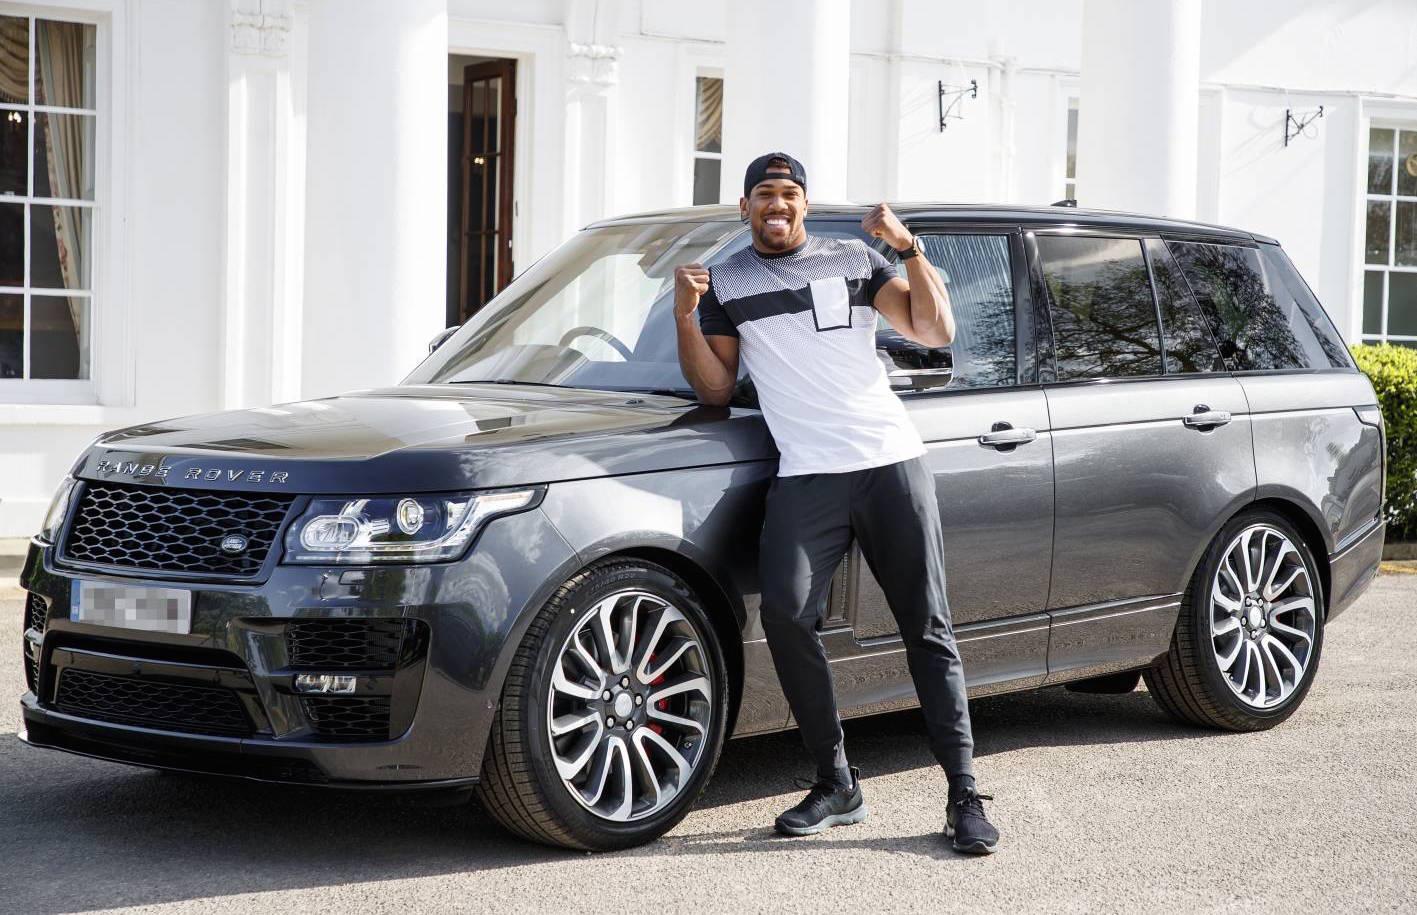 Boxing Champ Anthony Joshua Gets Range Rover